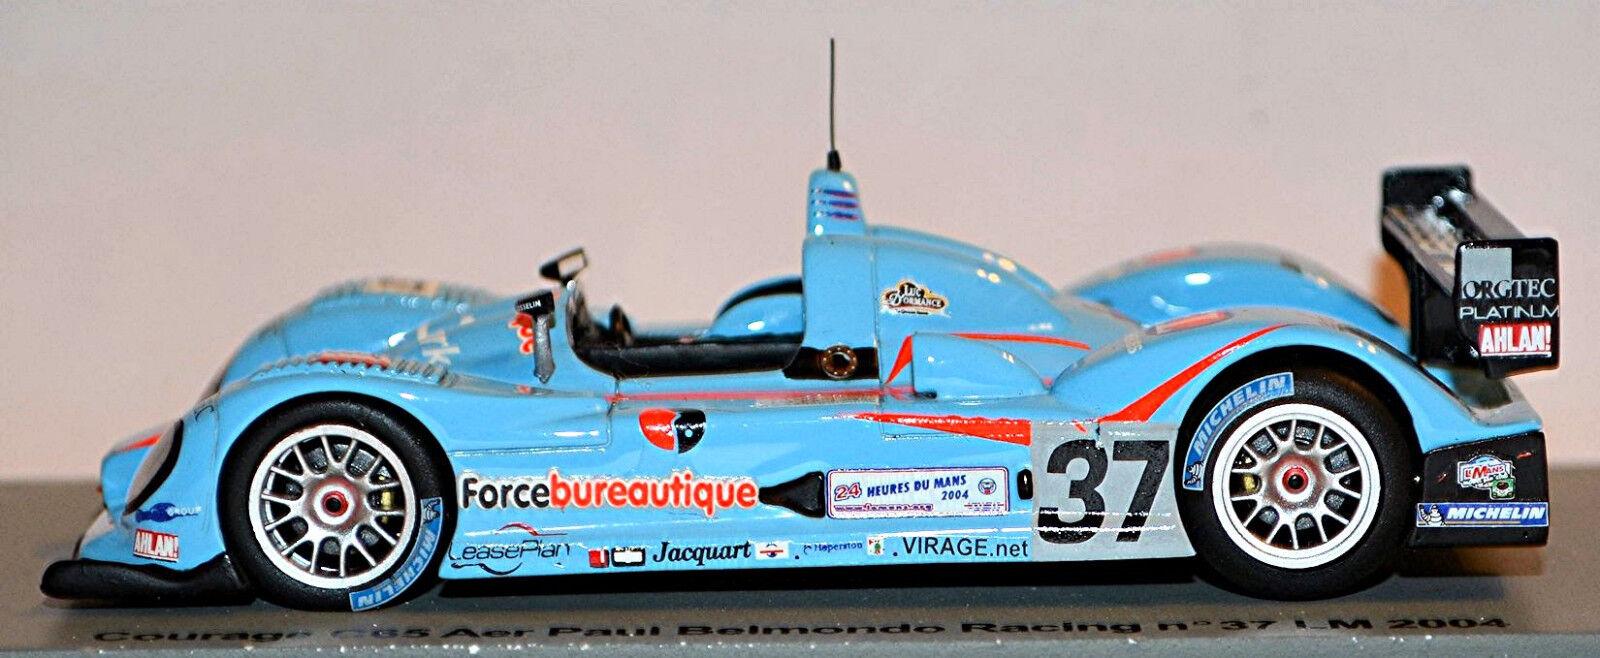 COURAGE C65 LEMANS 2004  37 BELMONDO BELMONDO BELMONDO Gosselin saviozzi 1 43 Spark 644a22